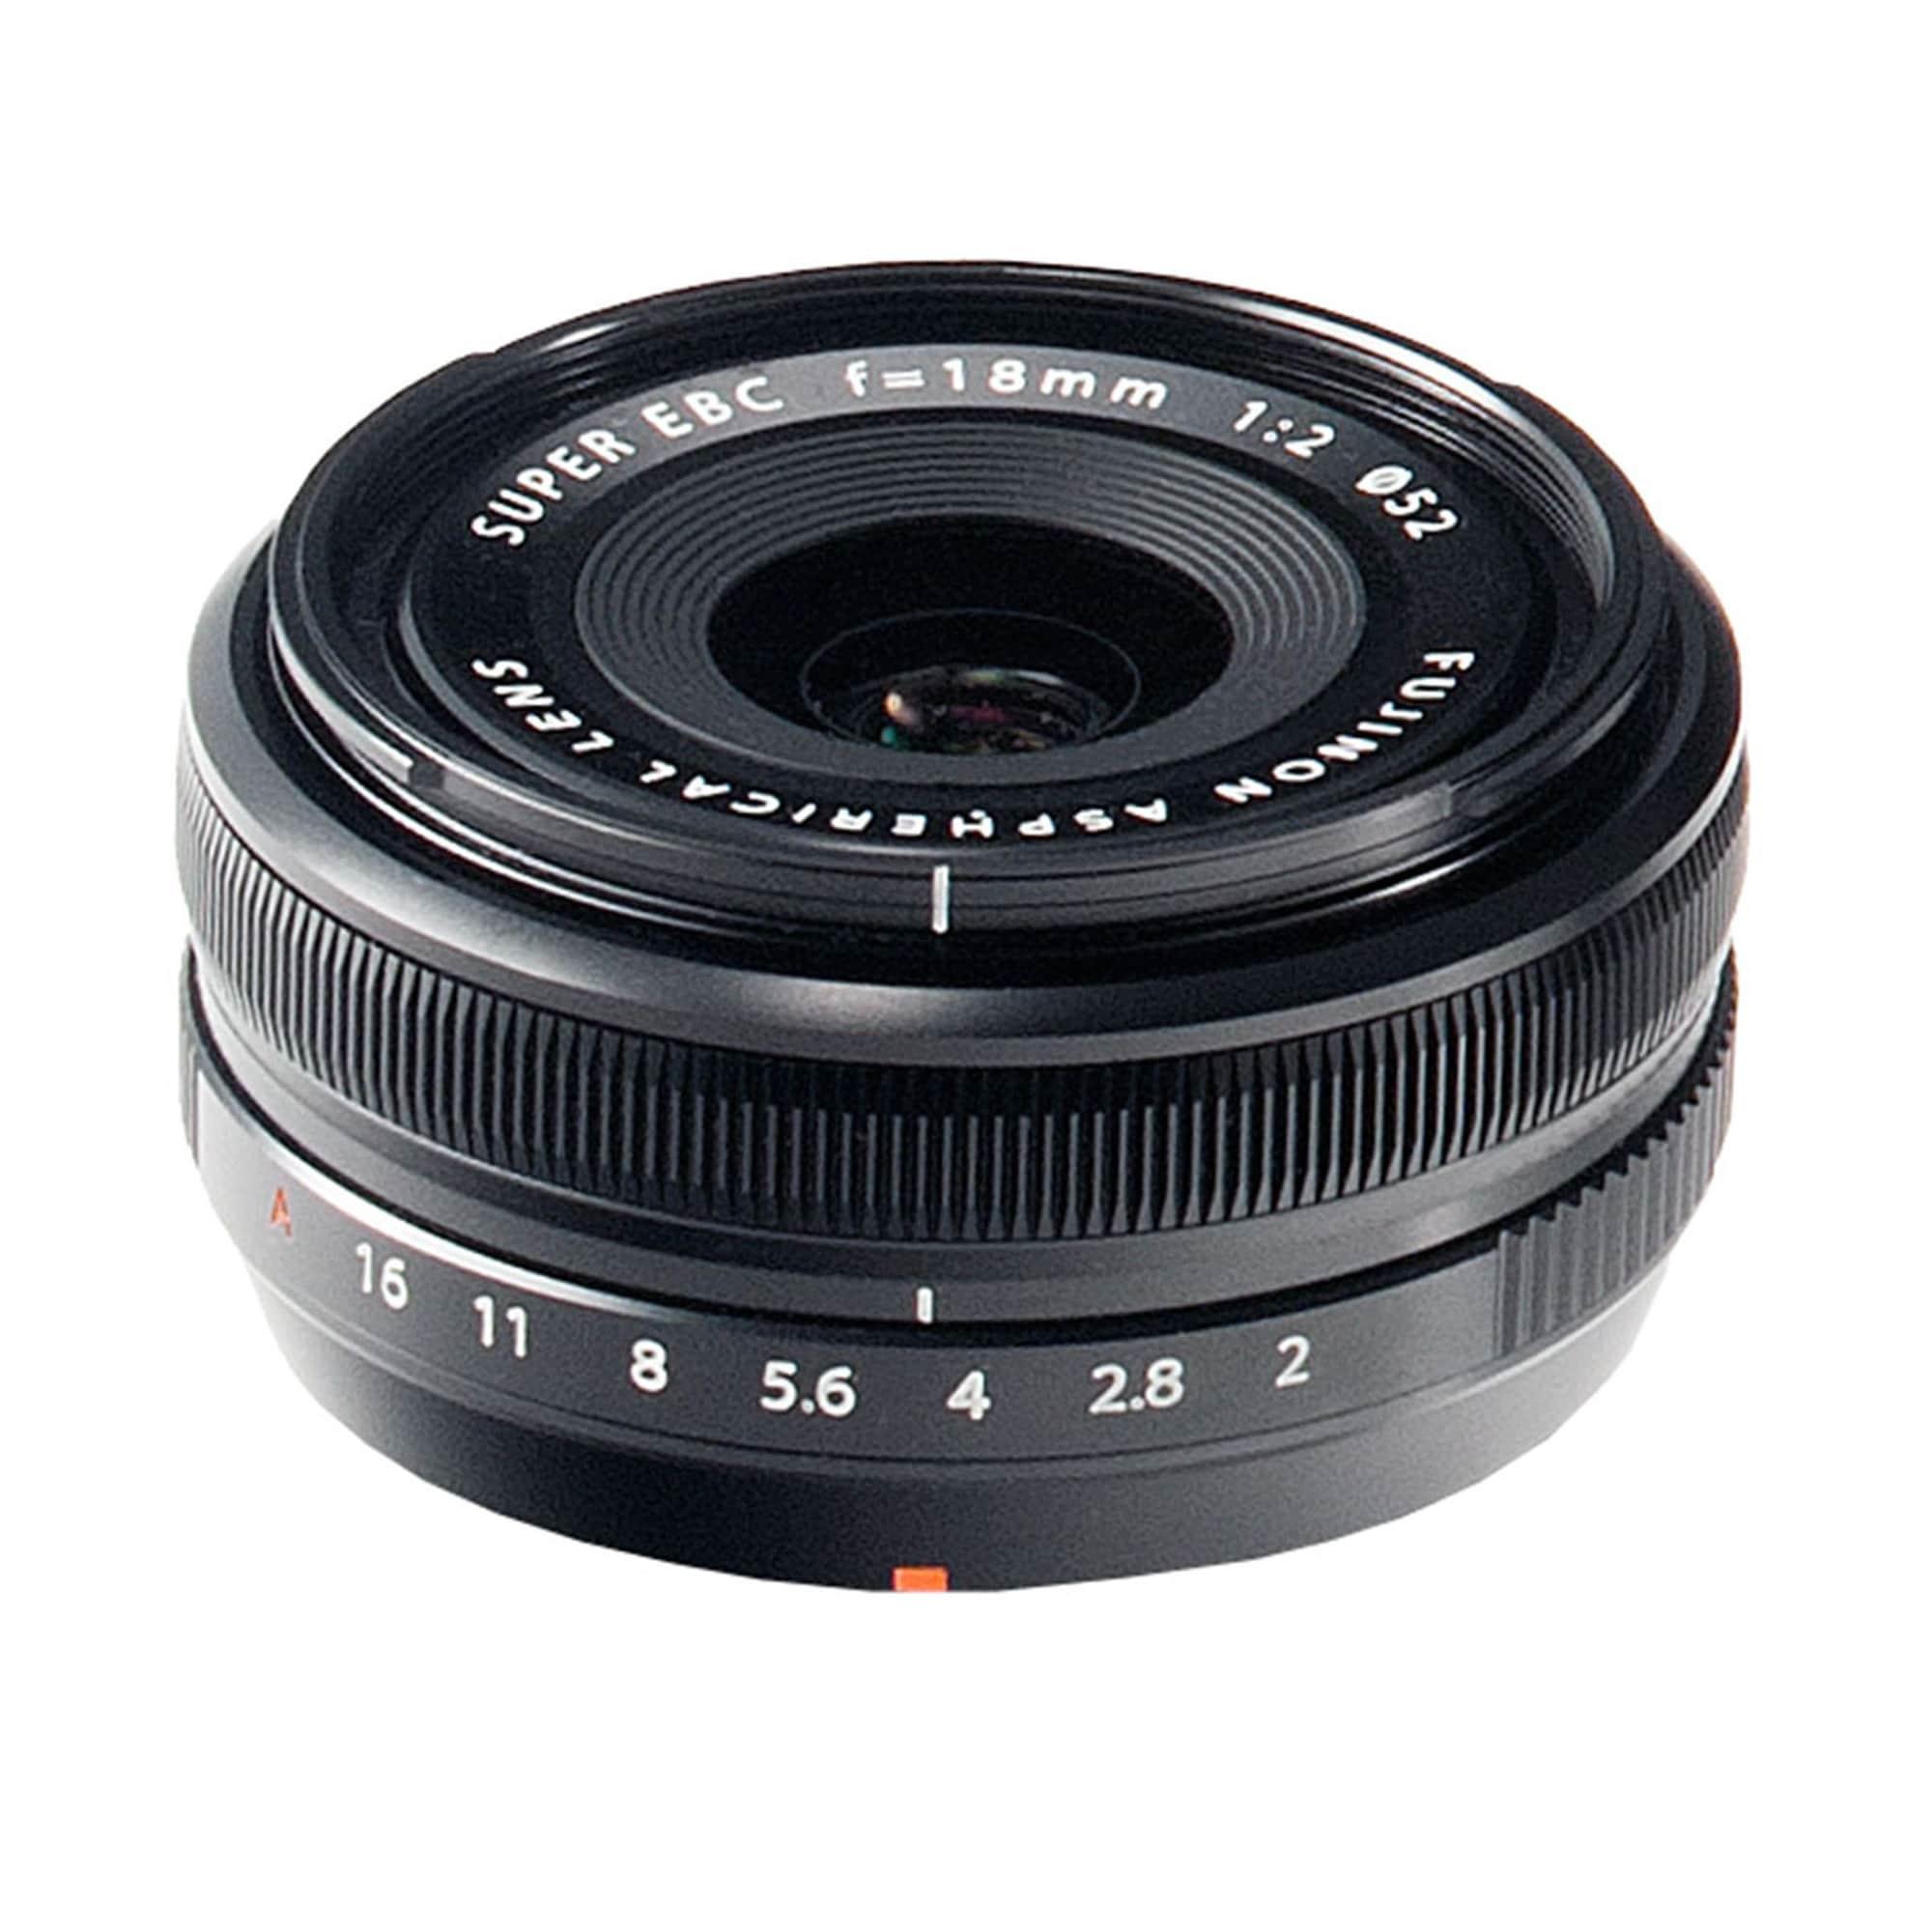 Fujifilm Fujinon 18mm f/2,0 - DEMO EX